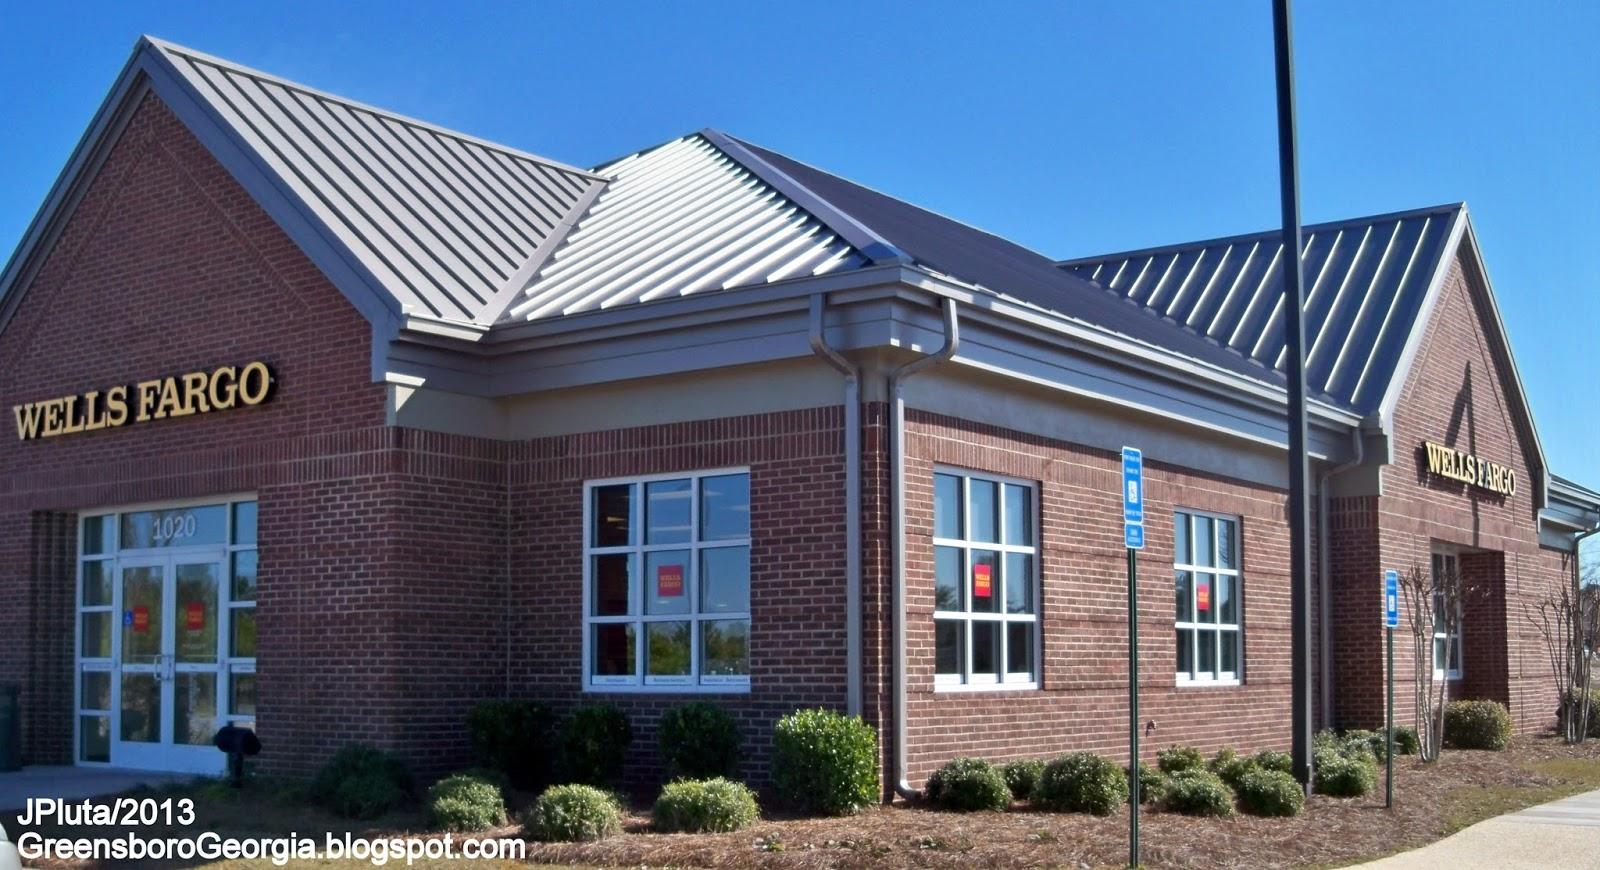 Greensboro Georgia Greene Lake Oconee Golf Restaurant Bank Attorney